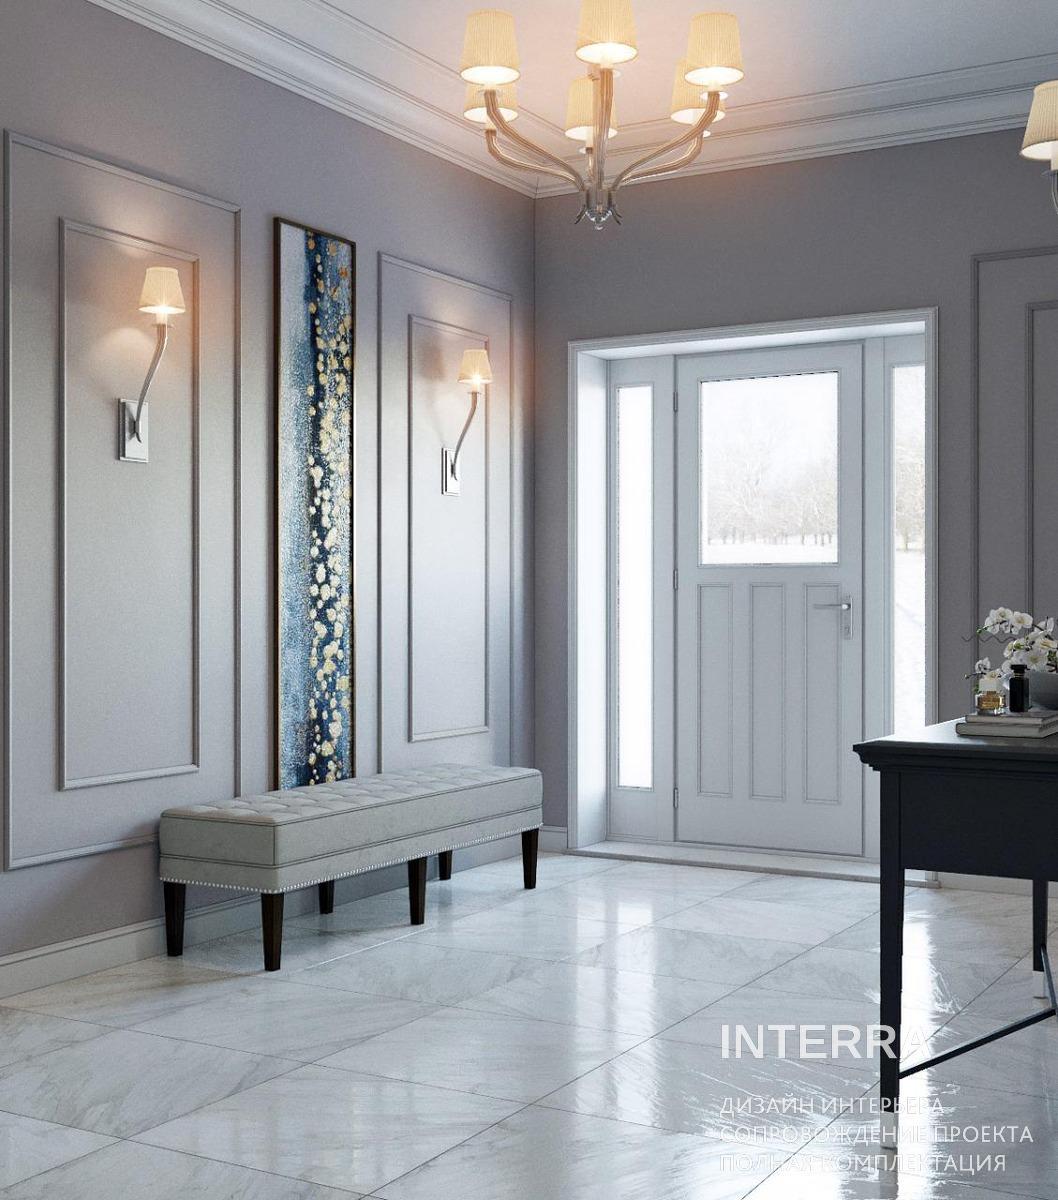 dizayn-interiera-dom-v-raubichax_36.jpg